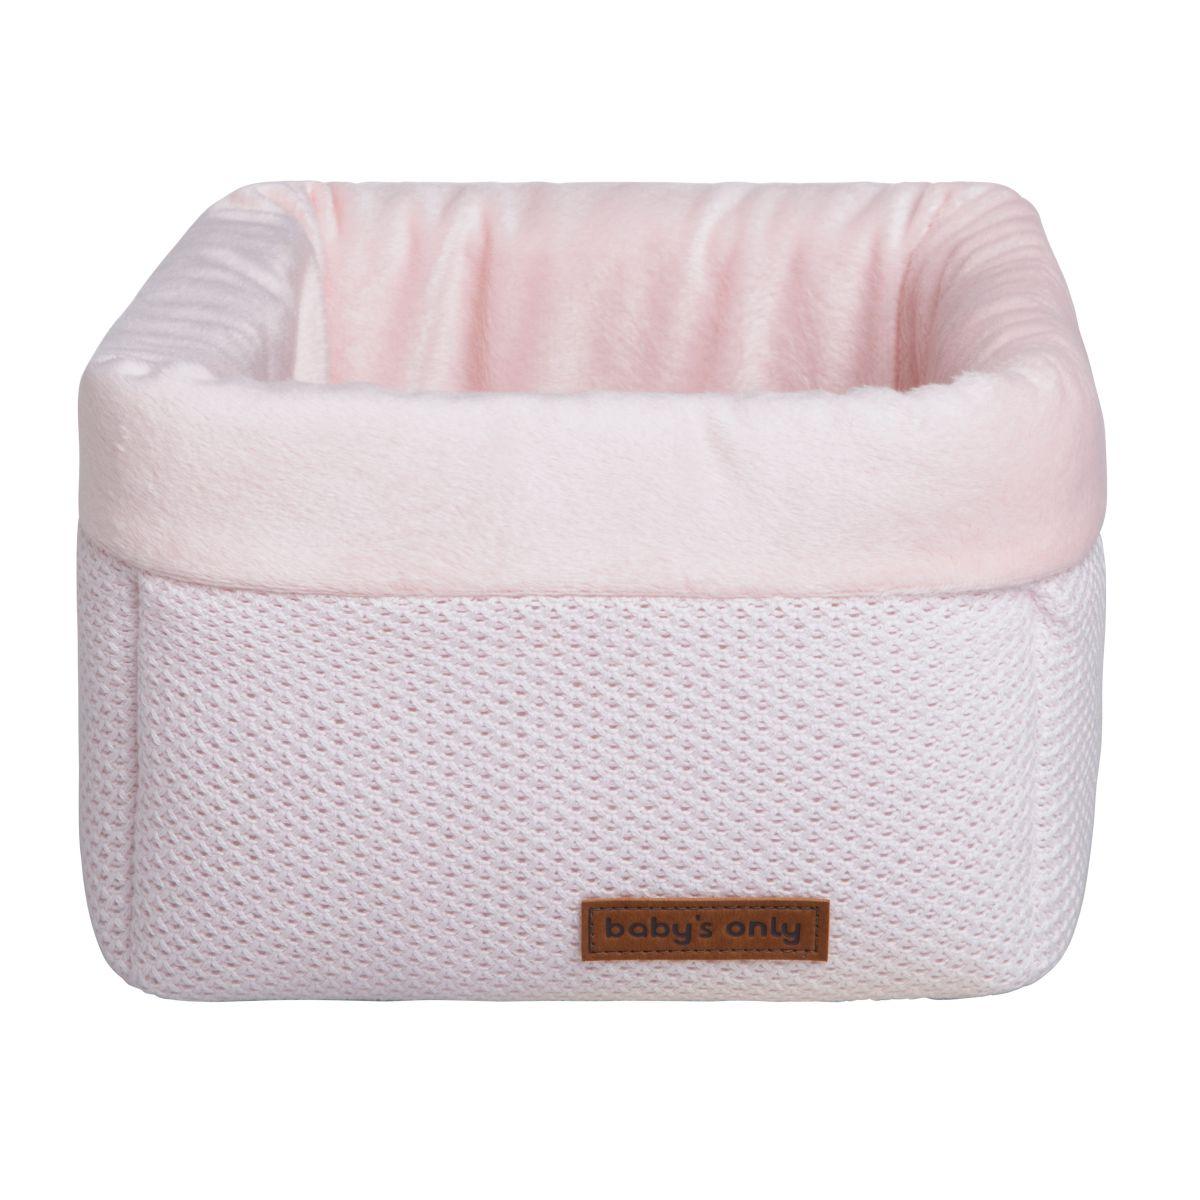 babys only 0203901 commodemandje classic roze